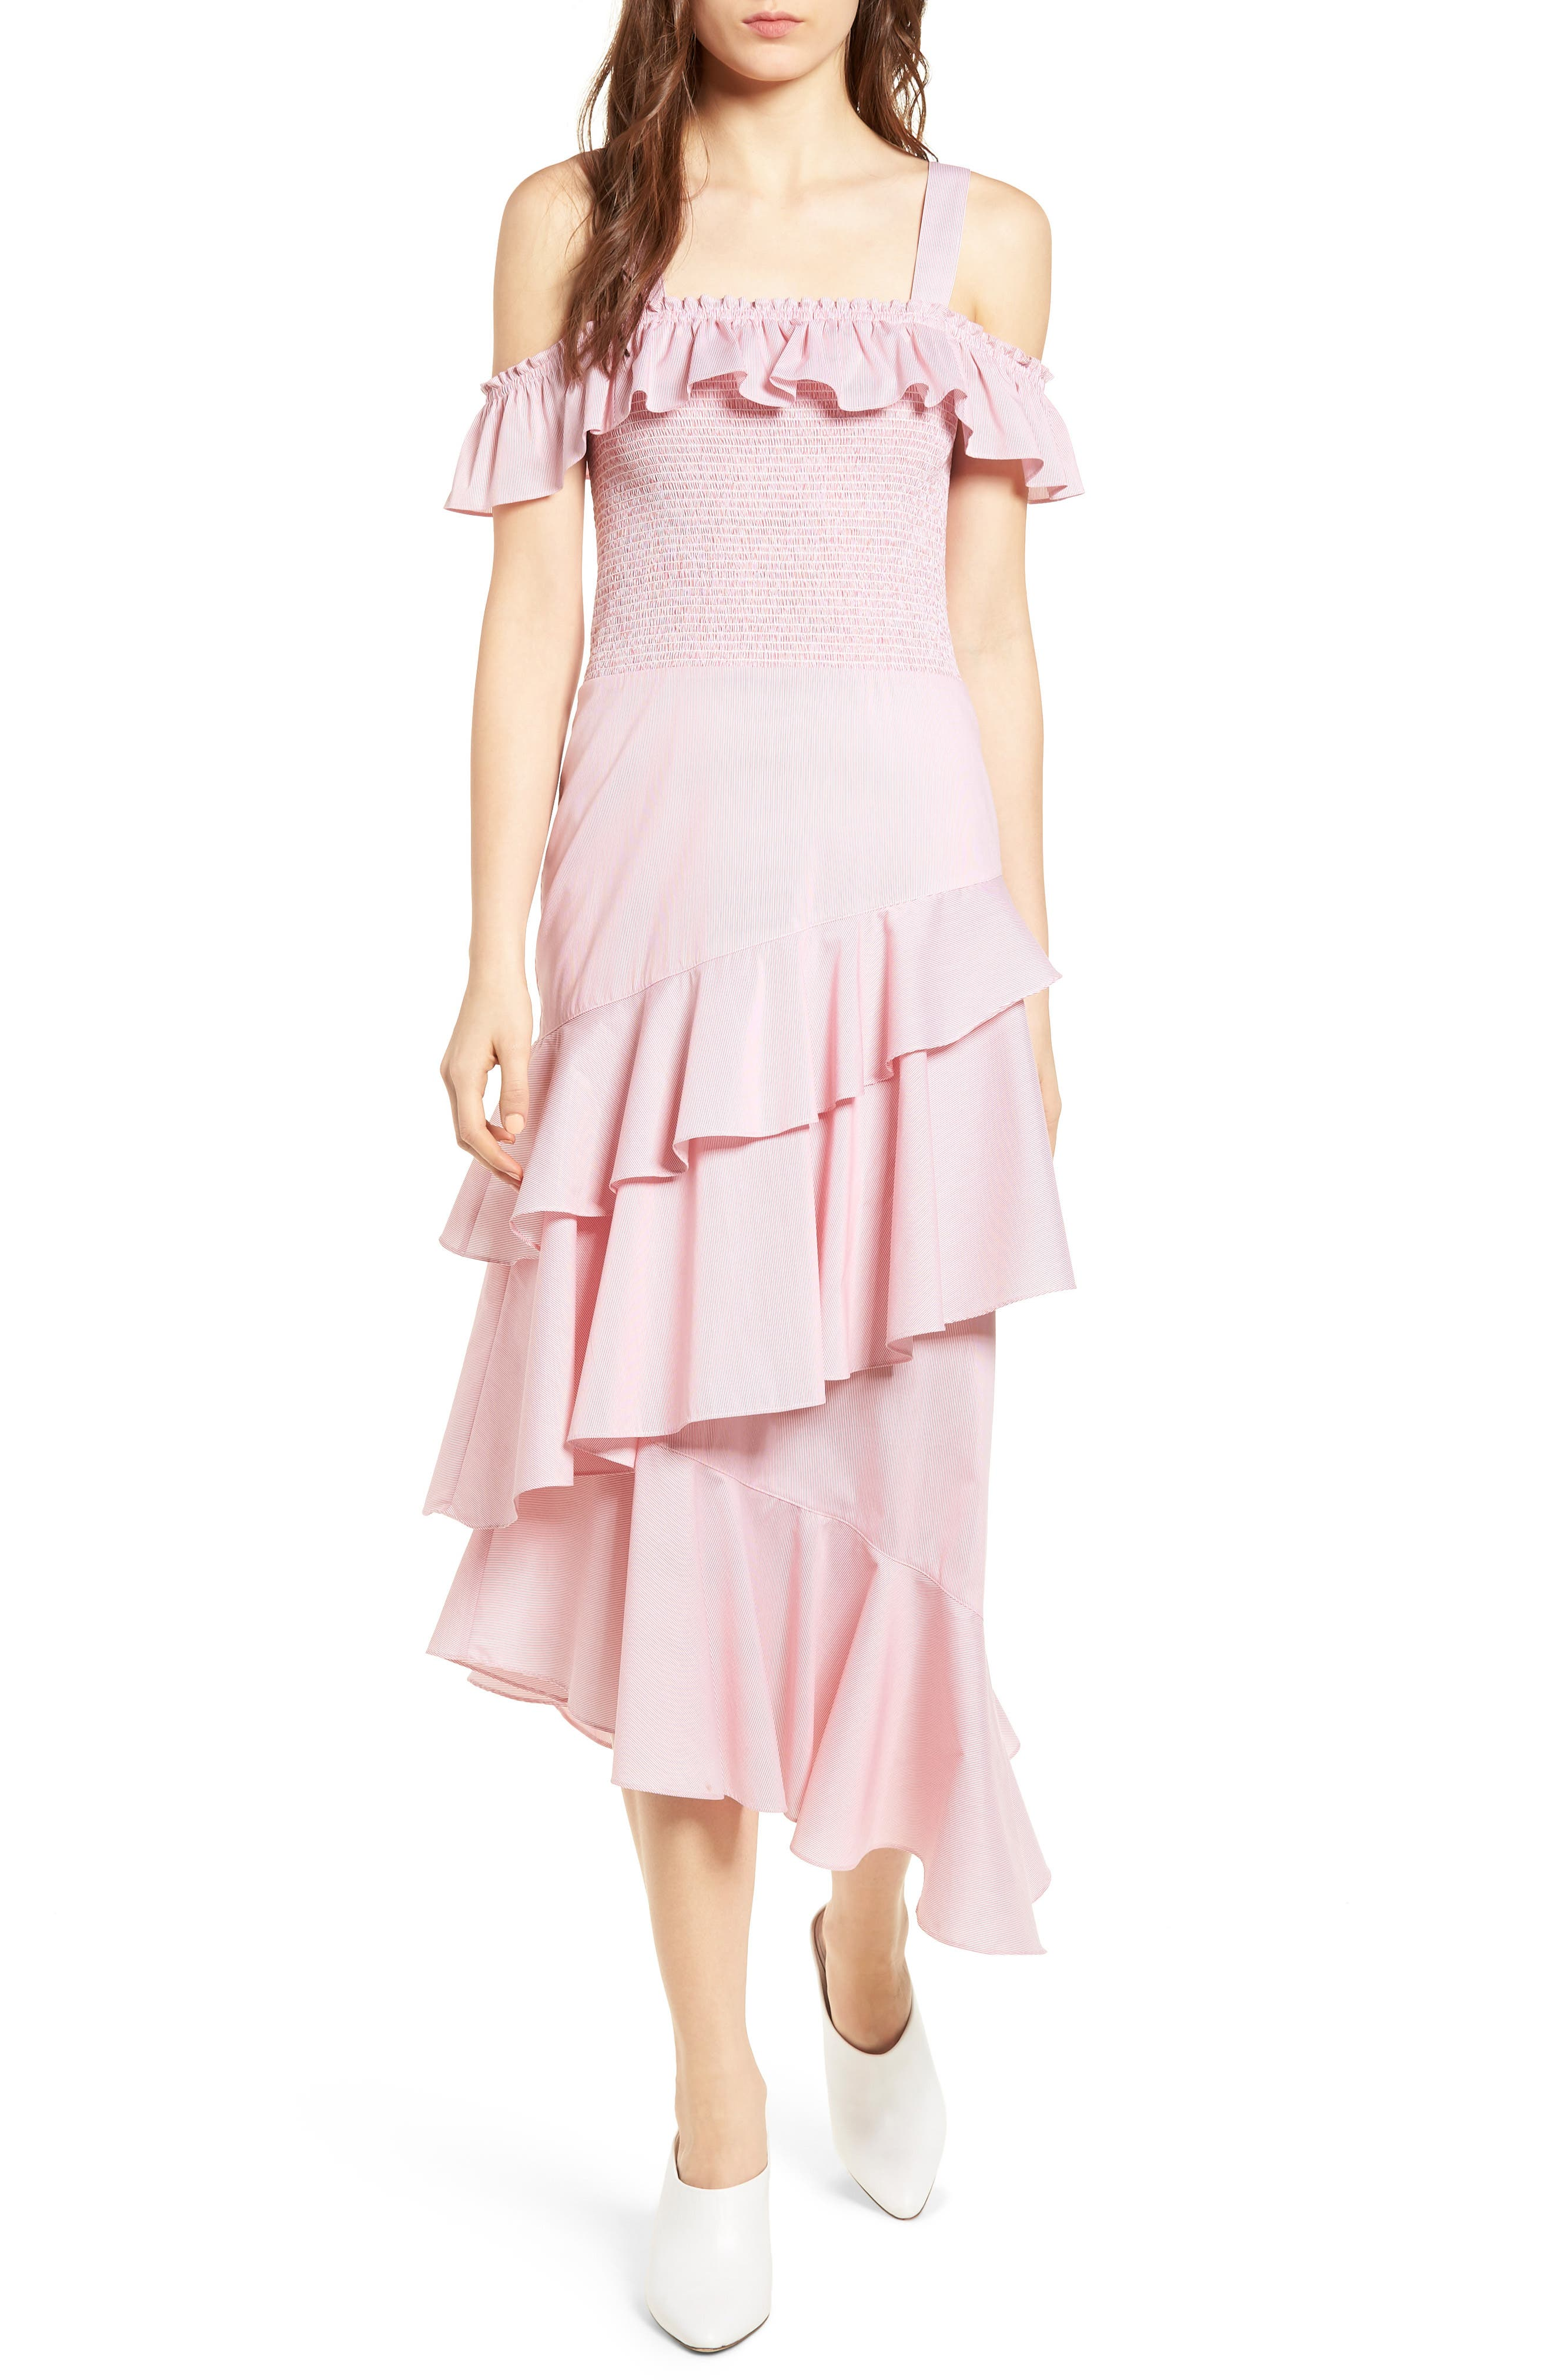 Main Image - Chelsea28 Ruffle Smocked Cold Shoulder Dress